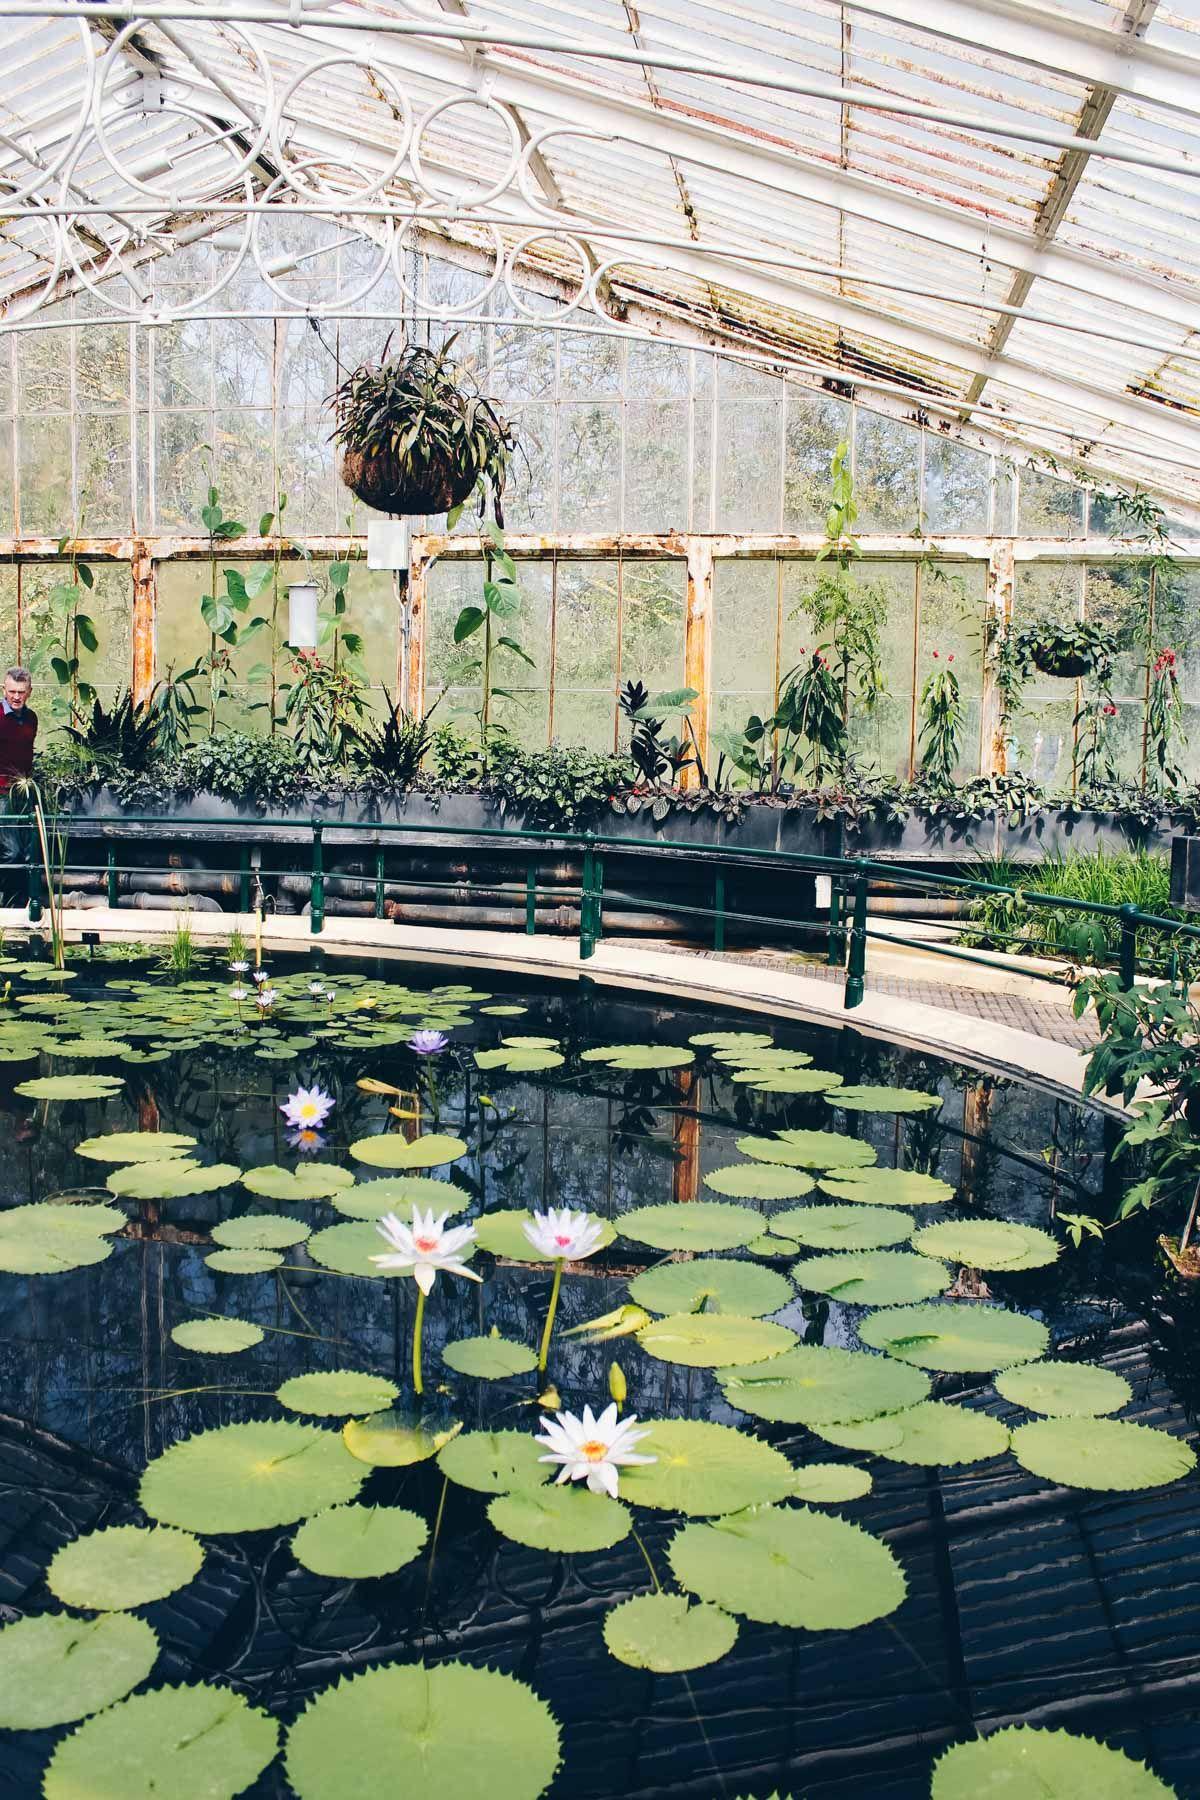 7ee84ecfbb9820acba510fd2b7b6b9d1 - Best Day To Visit Kew Gardens